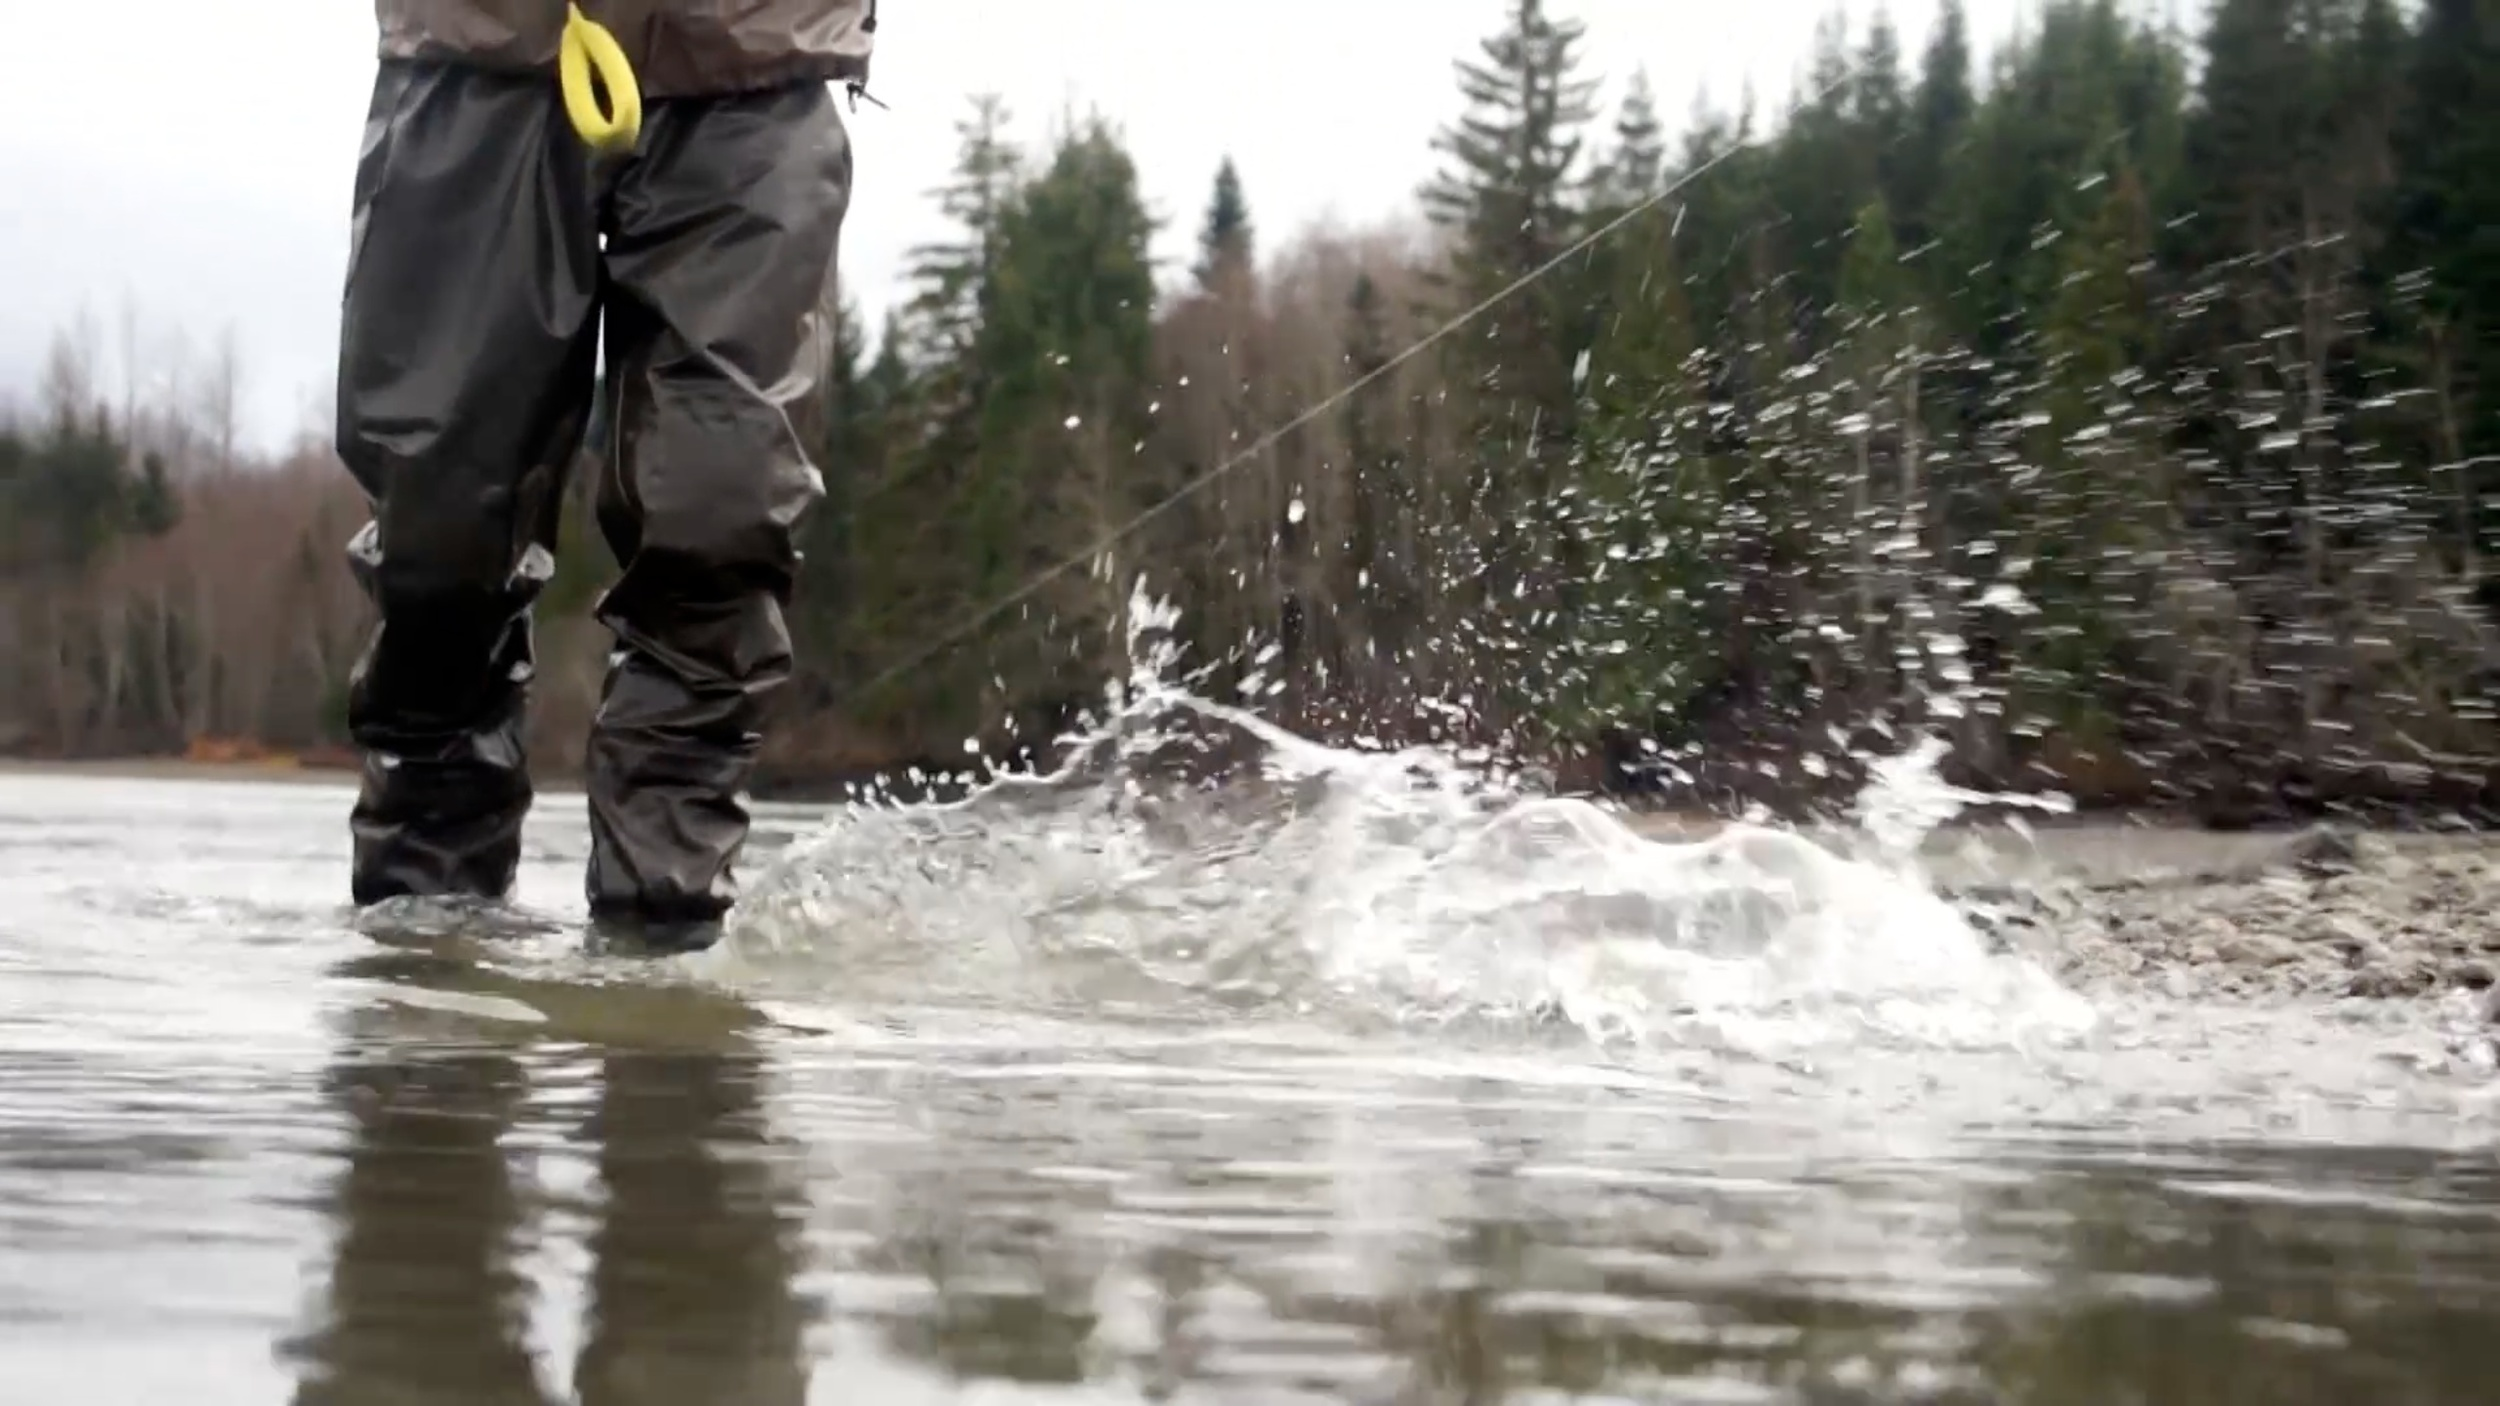 Steel splash 3.jpg